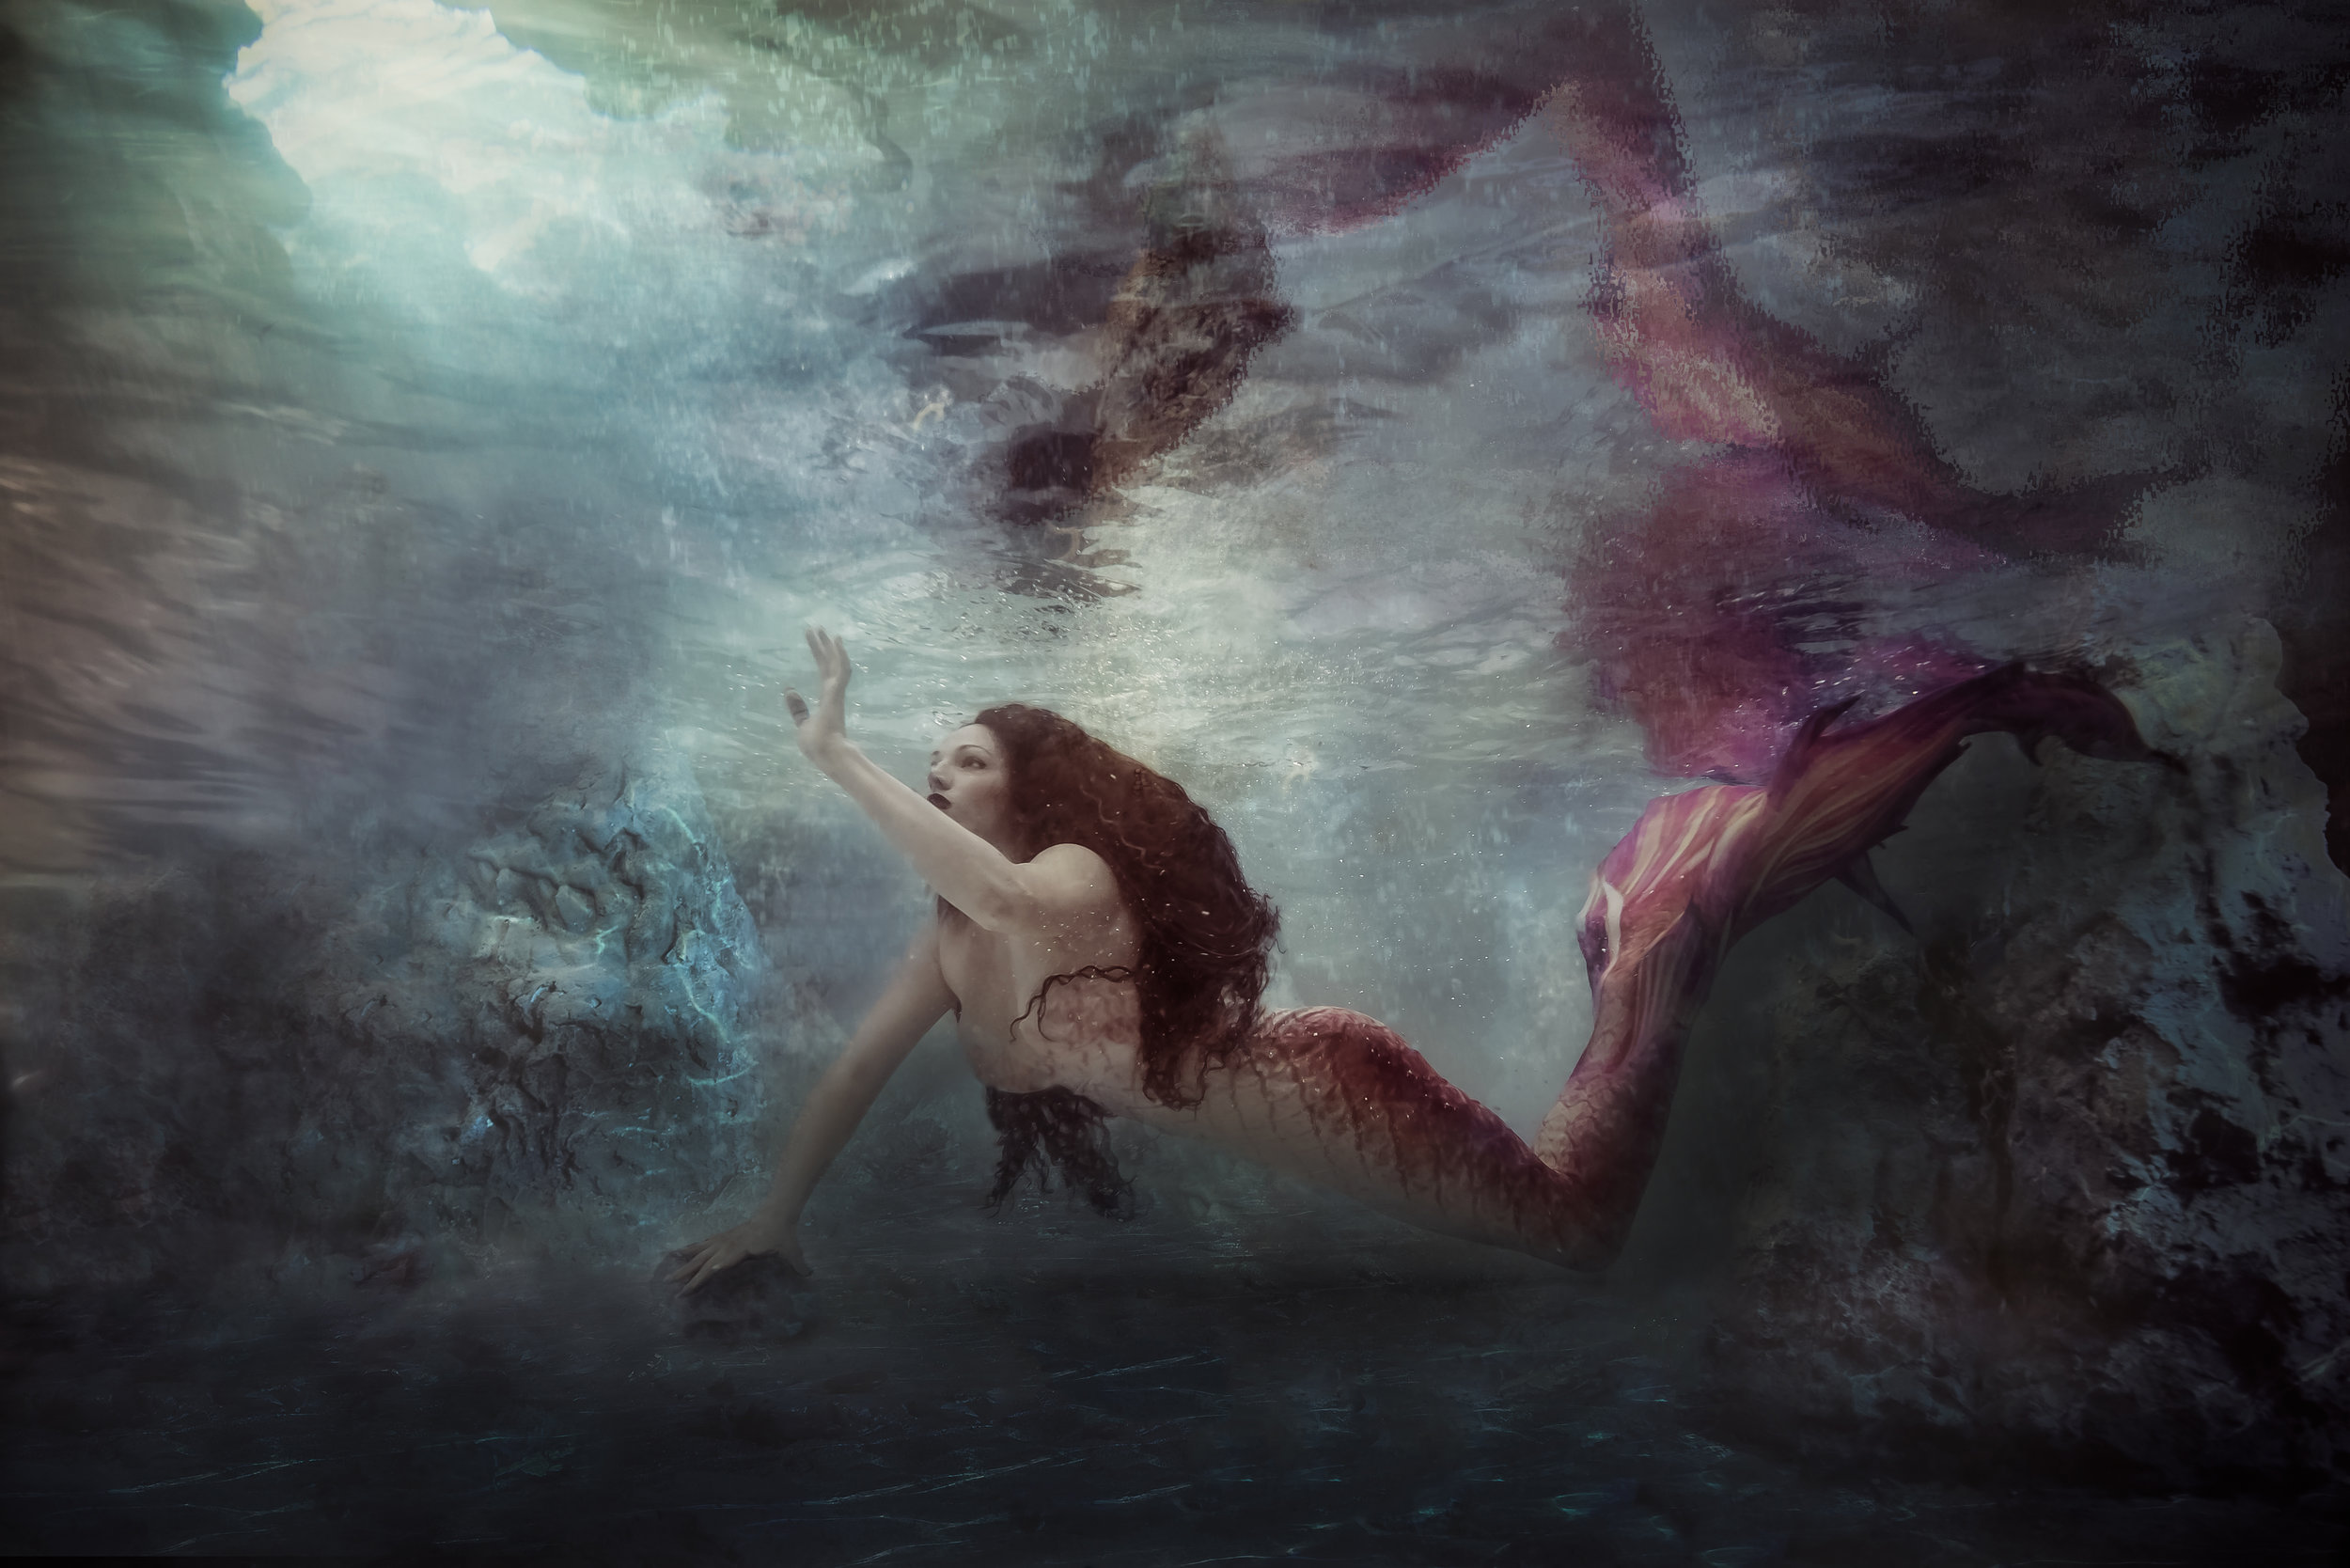 JTAqua_Underwater_BethClaire_mermaid-1.jpg